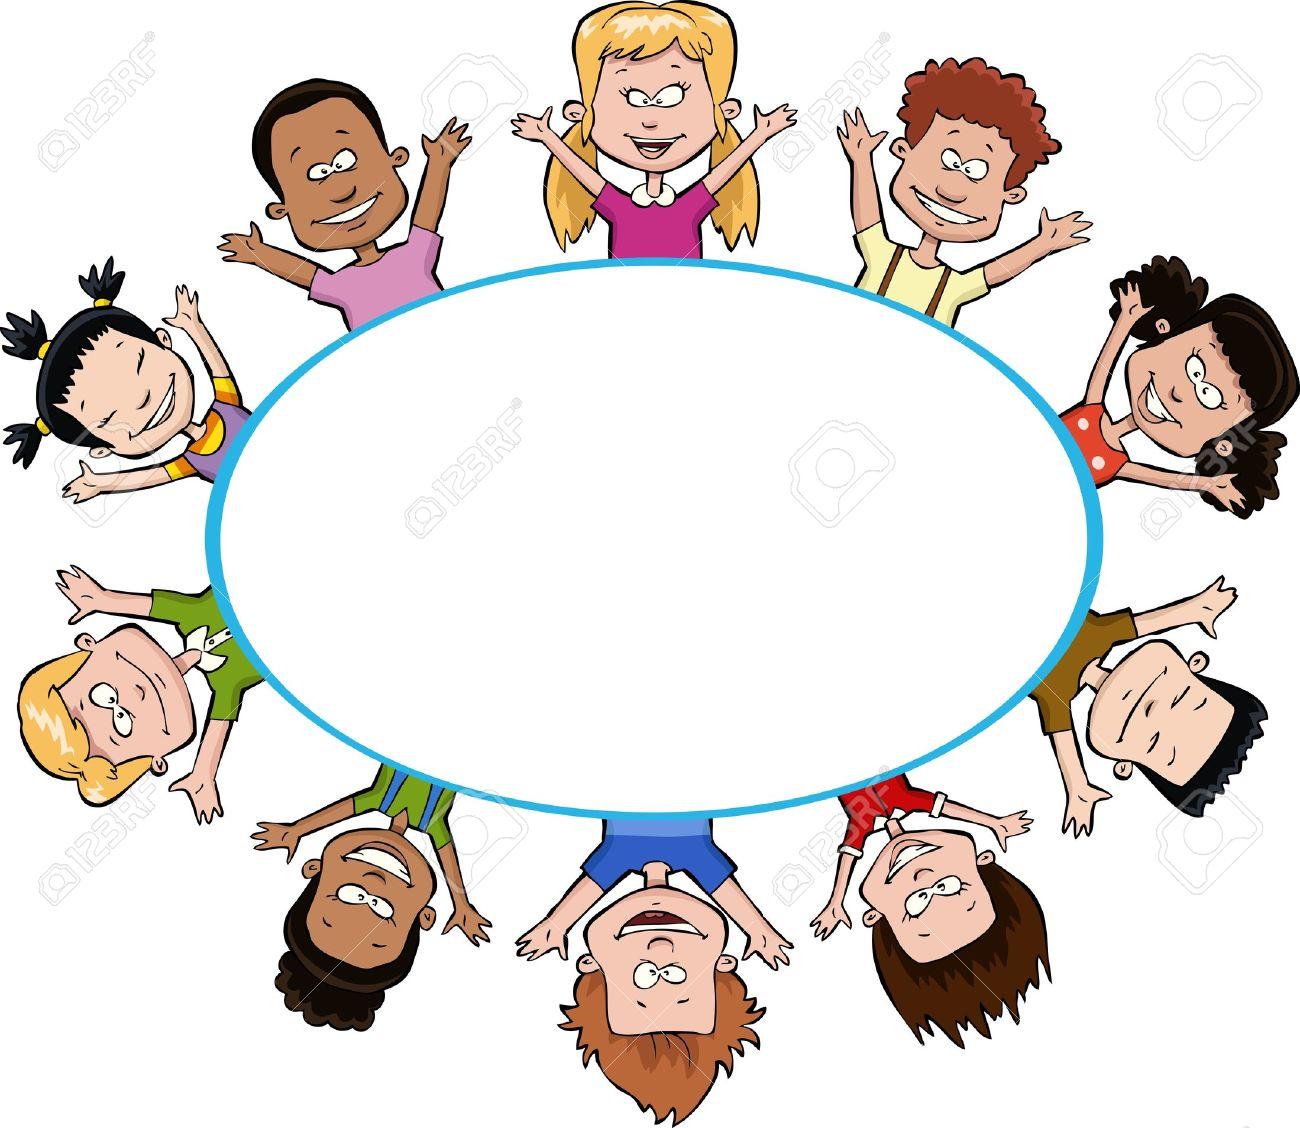 Cartoon children around the frame illustration Stock Vector - 16685613